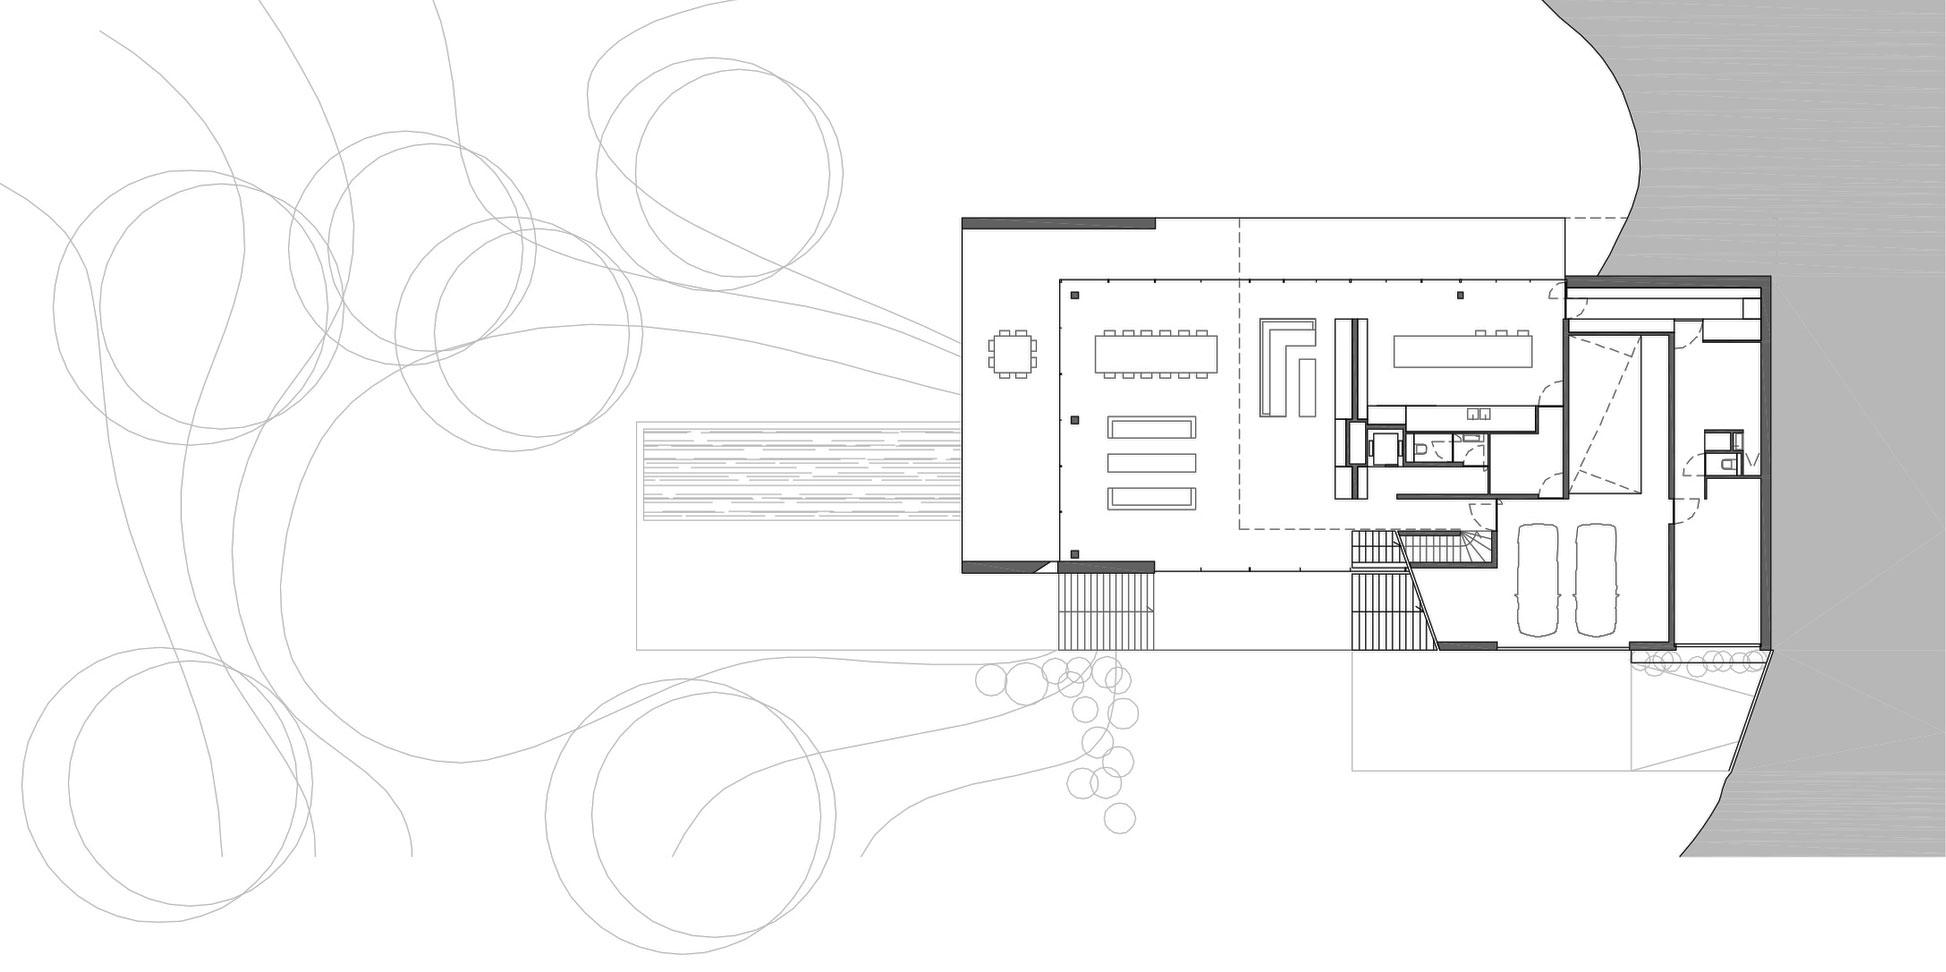 Ground Floor Plan, Sophisticated Glass Home in Belgium